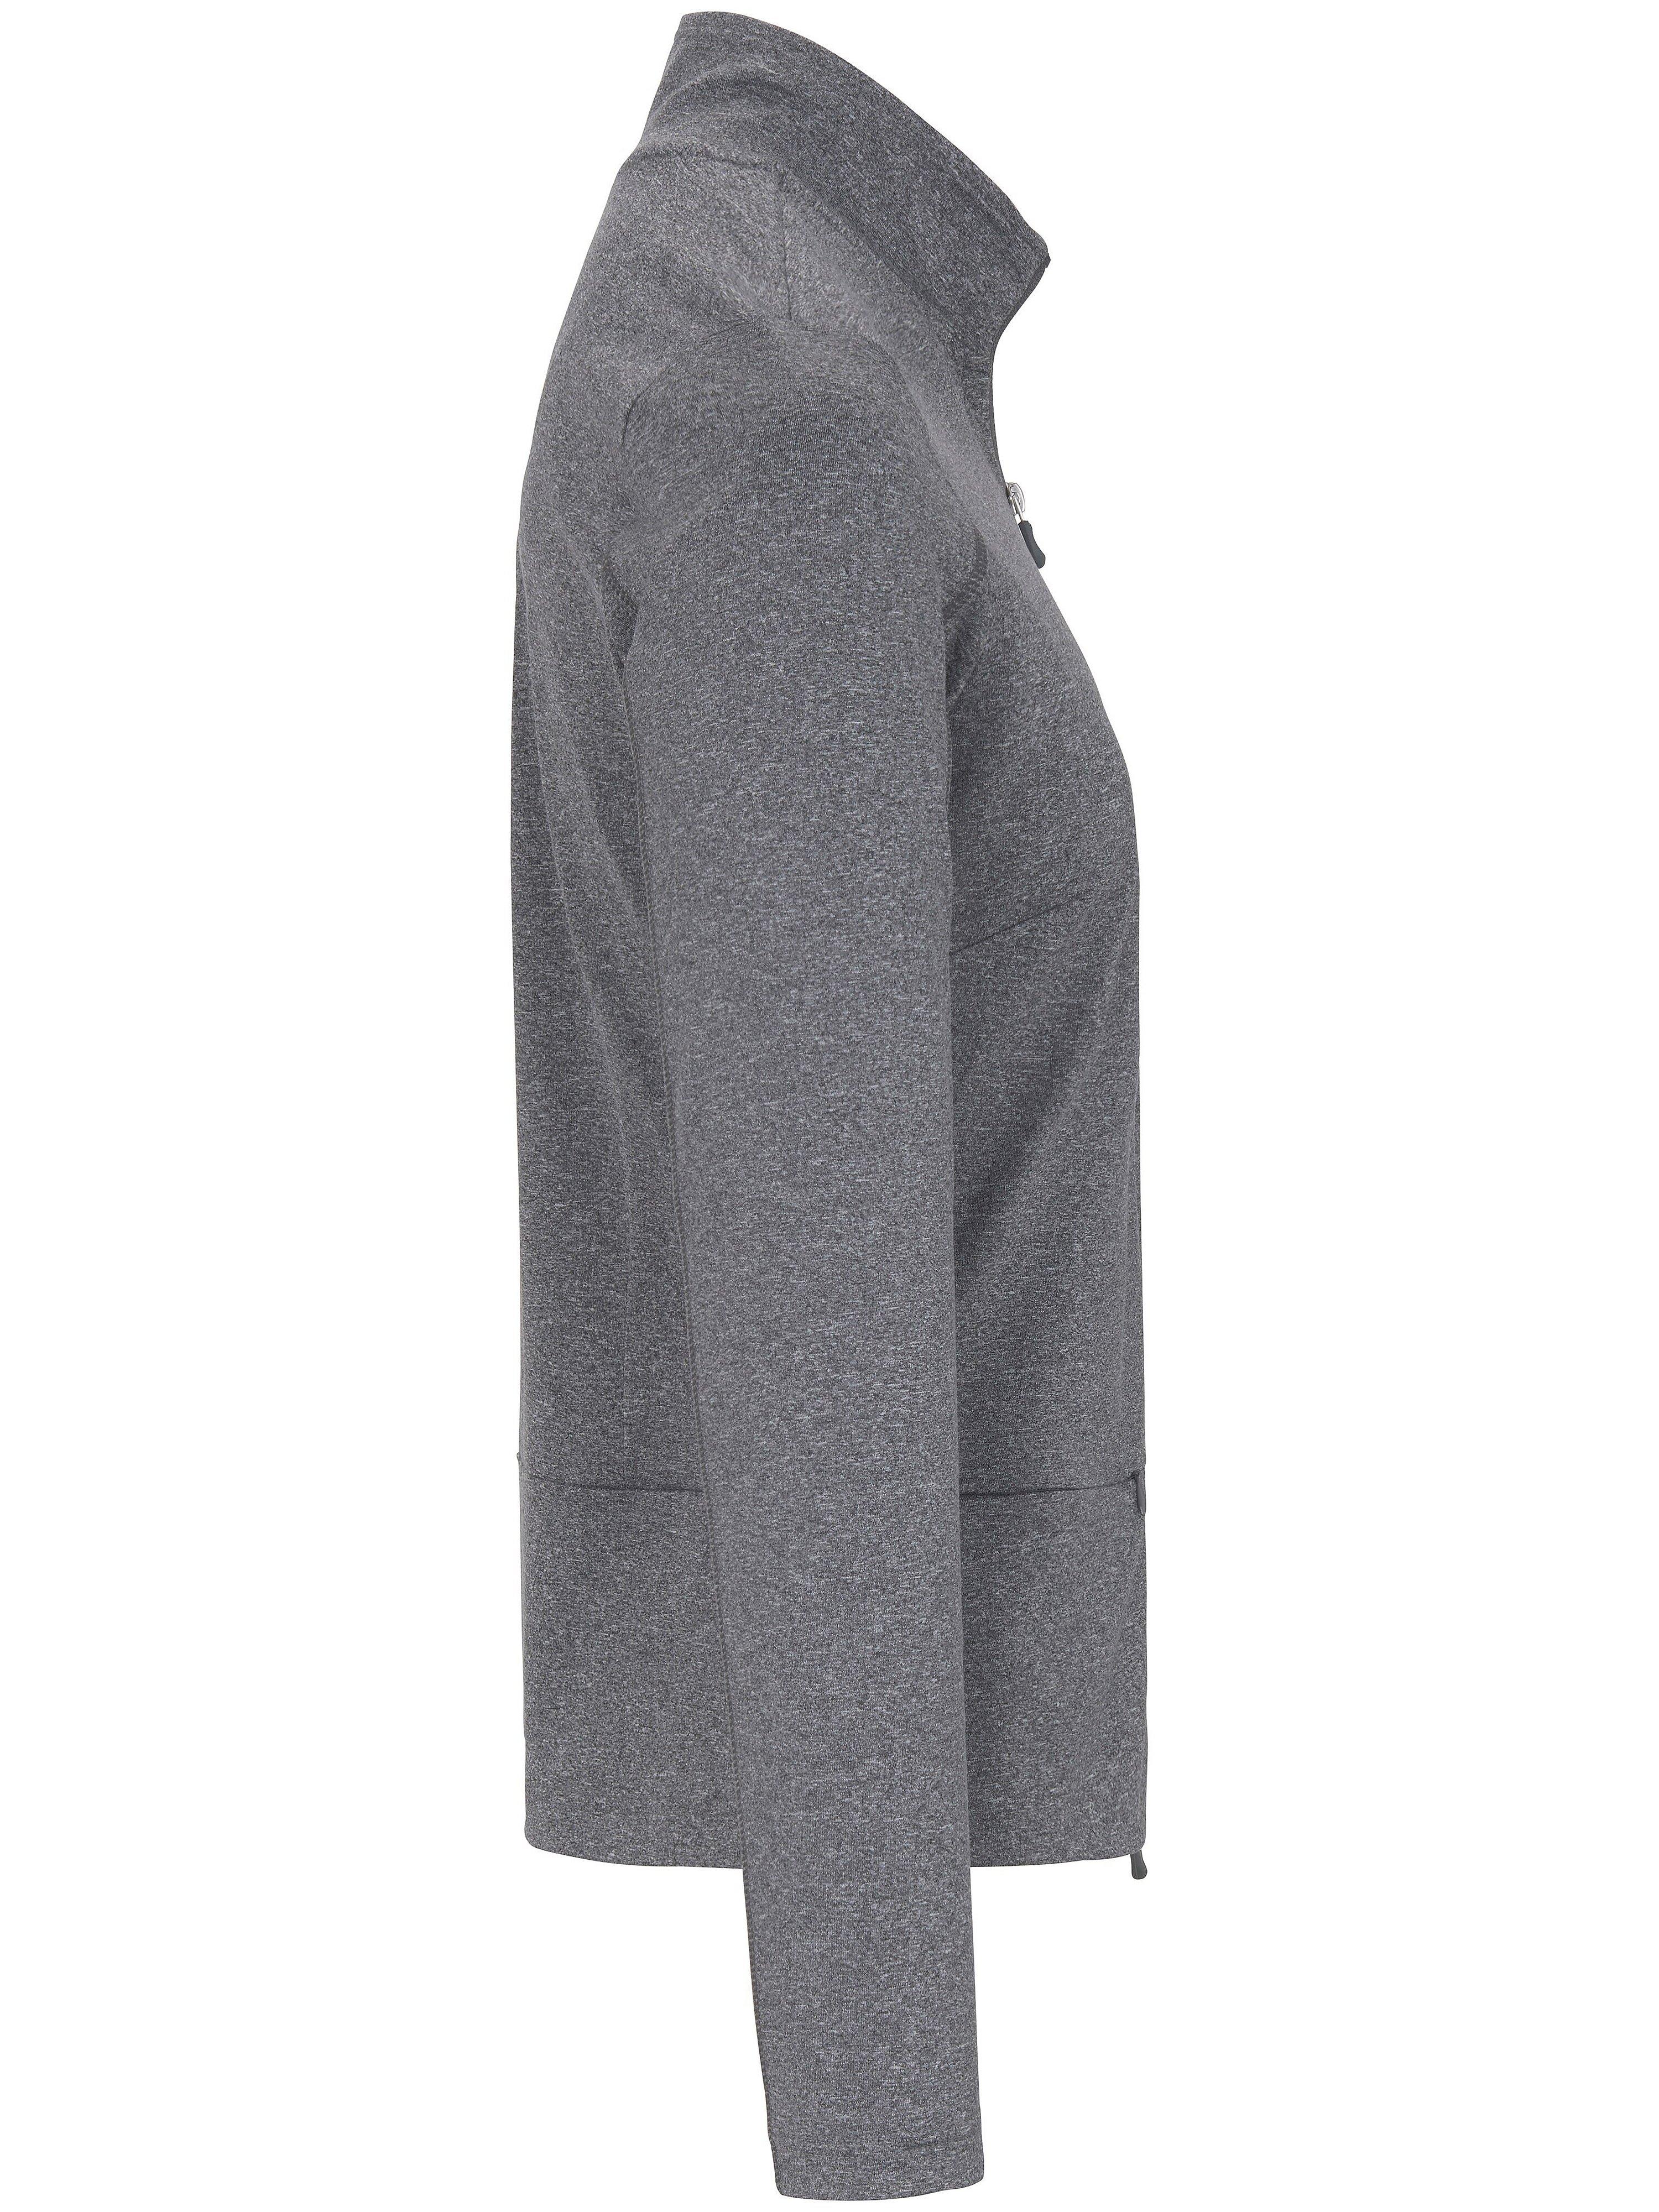 Jakke Pinella ståkrave Fra JOY Sportswear grå